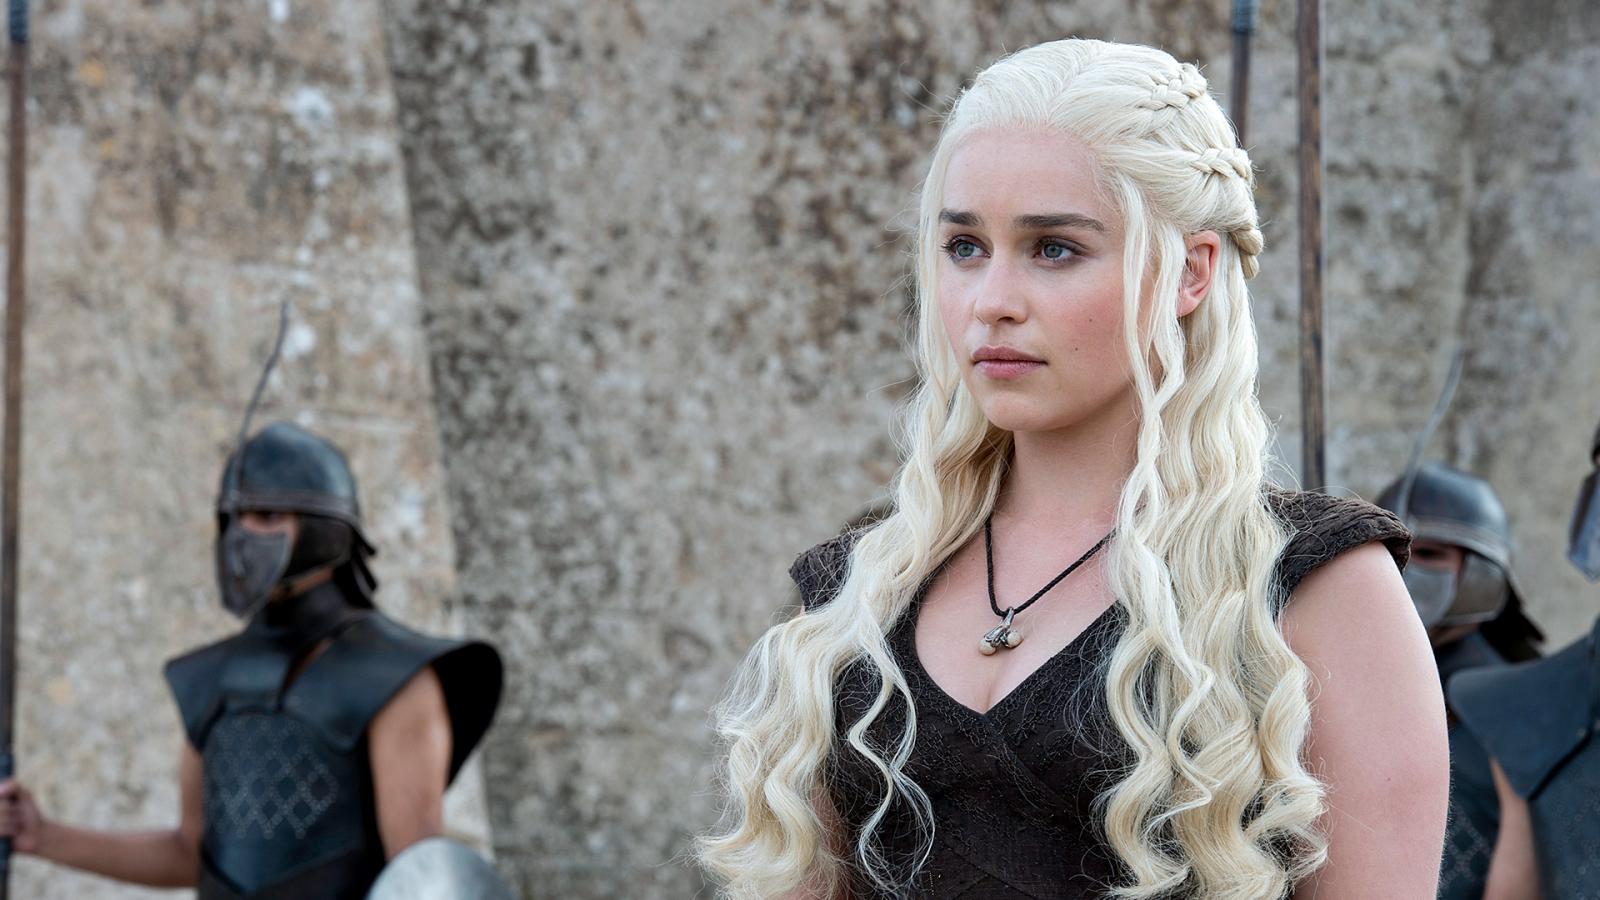 Game Of Thrones' Daenerys Targaryen Killed Off In Season 8